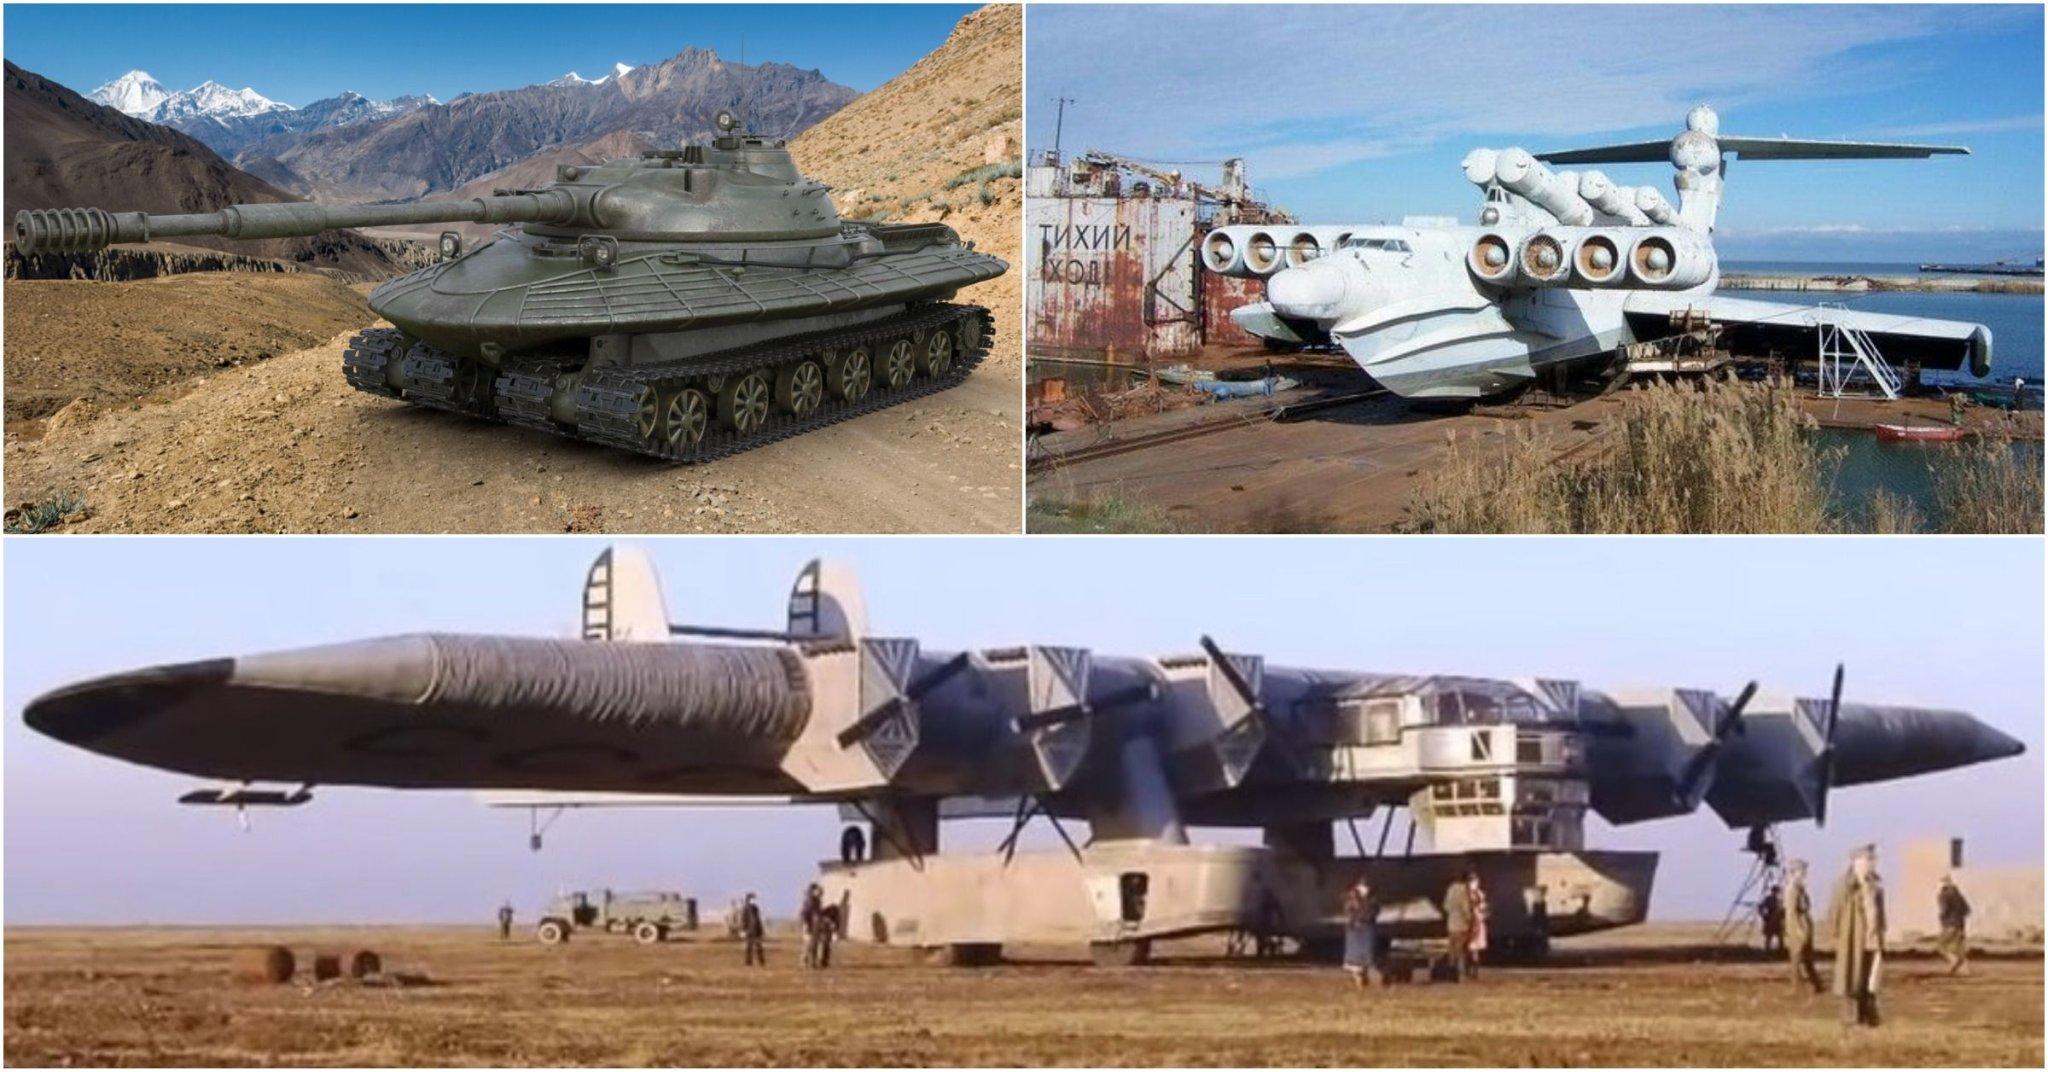 15 Crazy, Top Secret Soviet Military Vehicles That Make No Sense